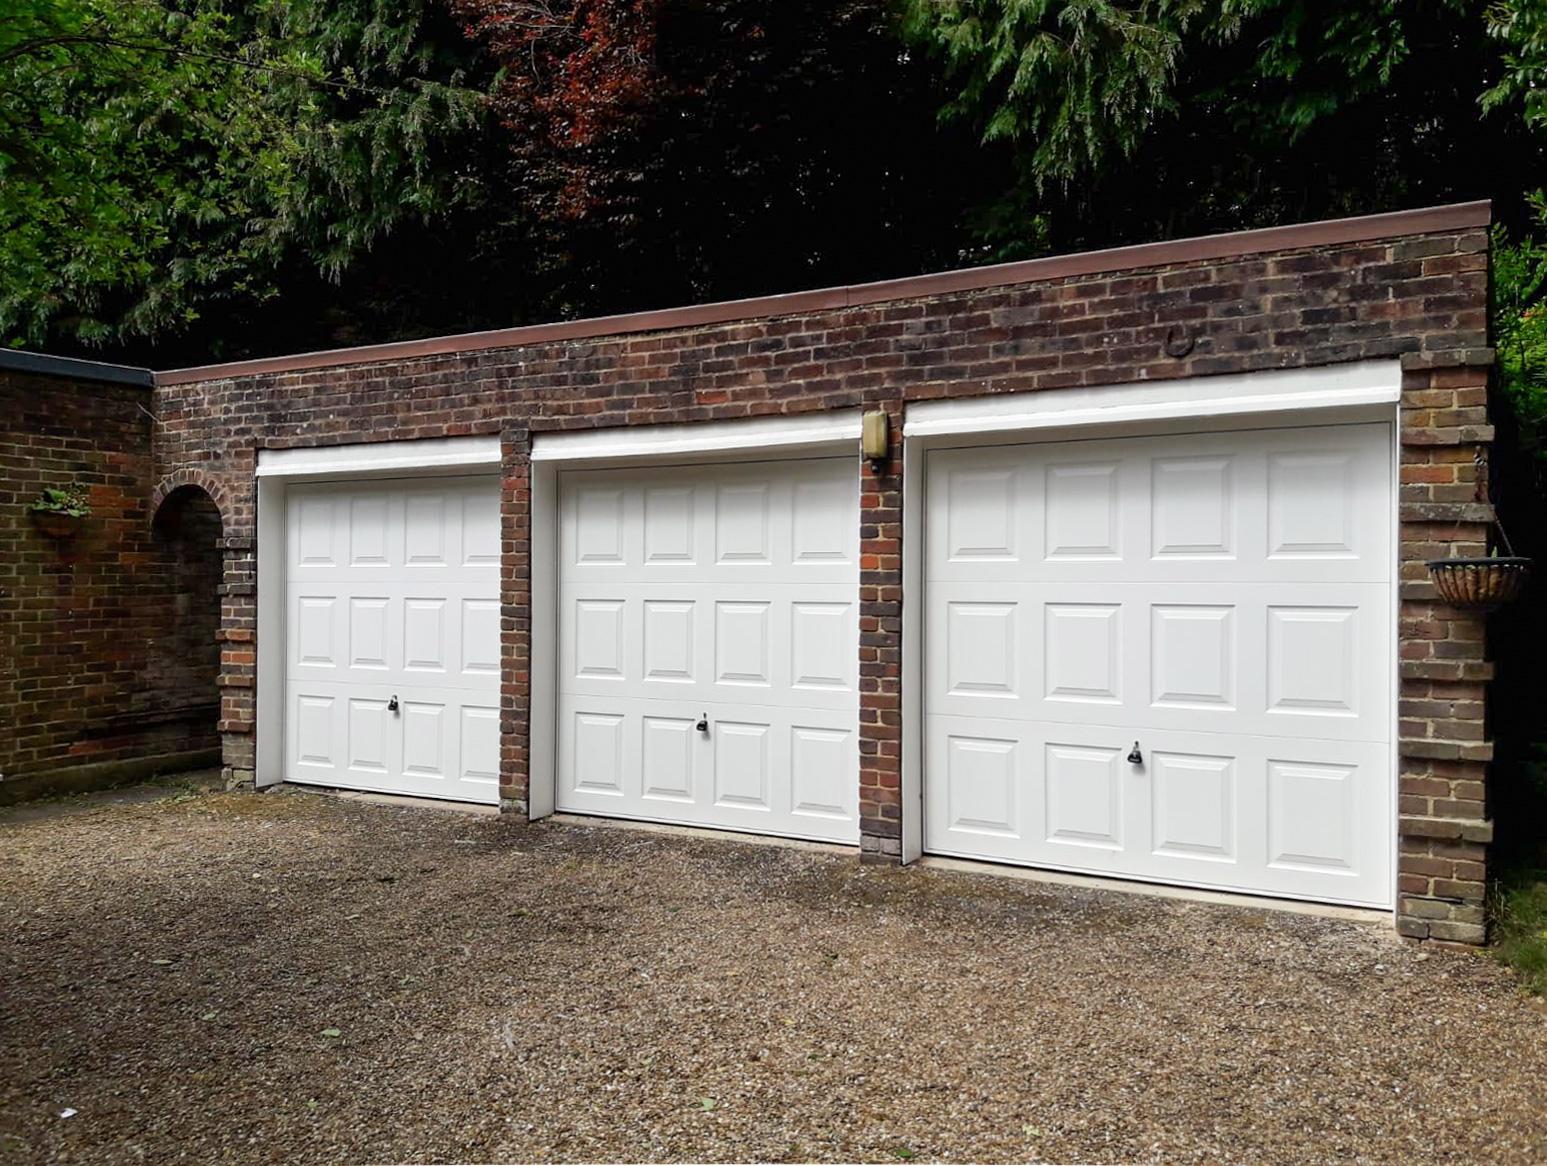 A trio of Garador Georgian up and over garage doors in white